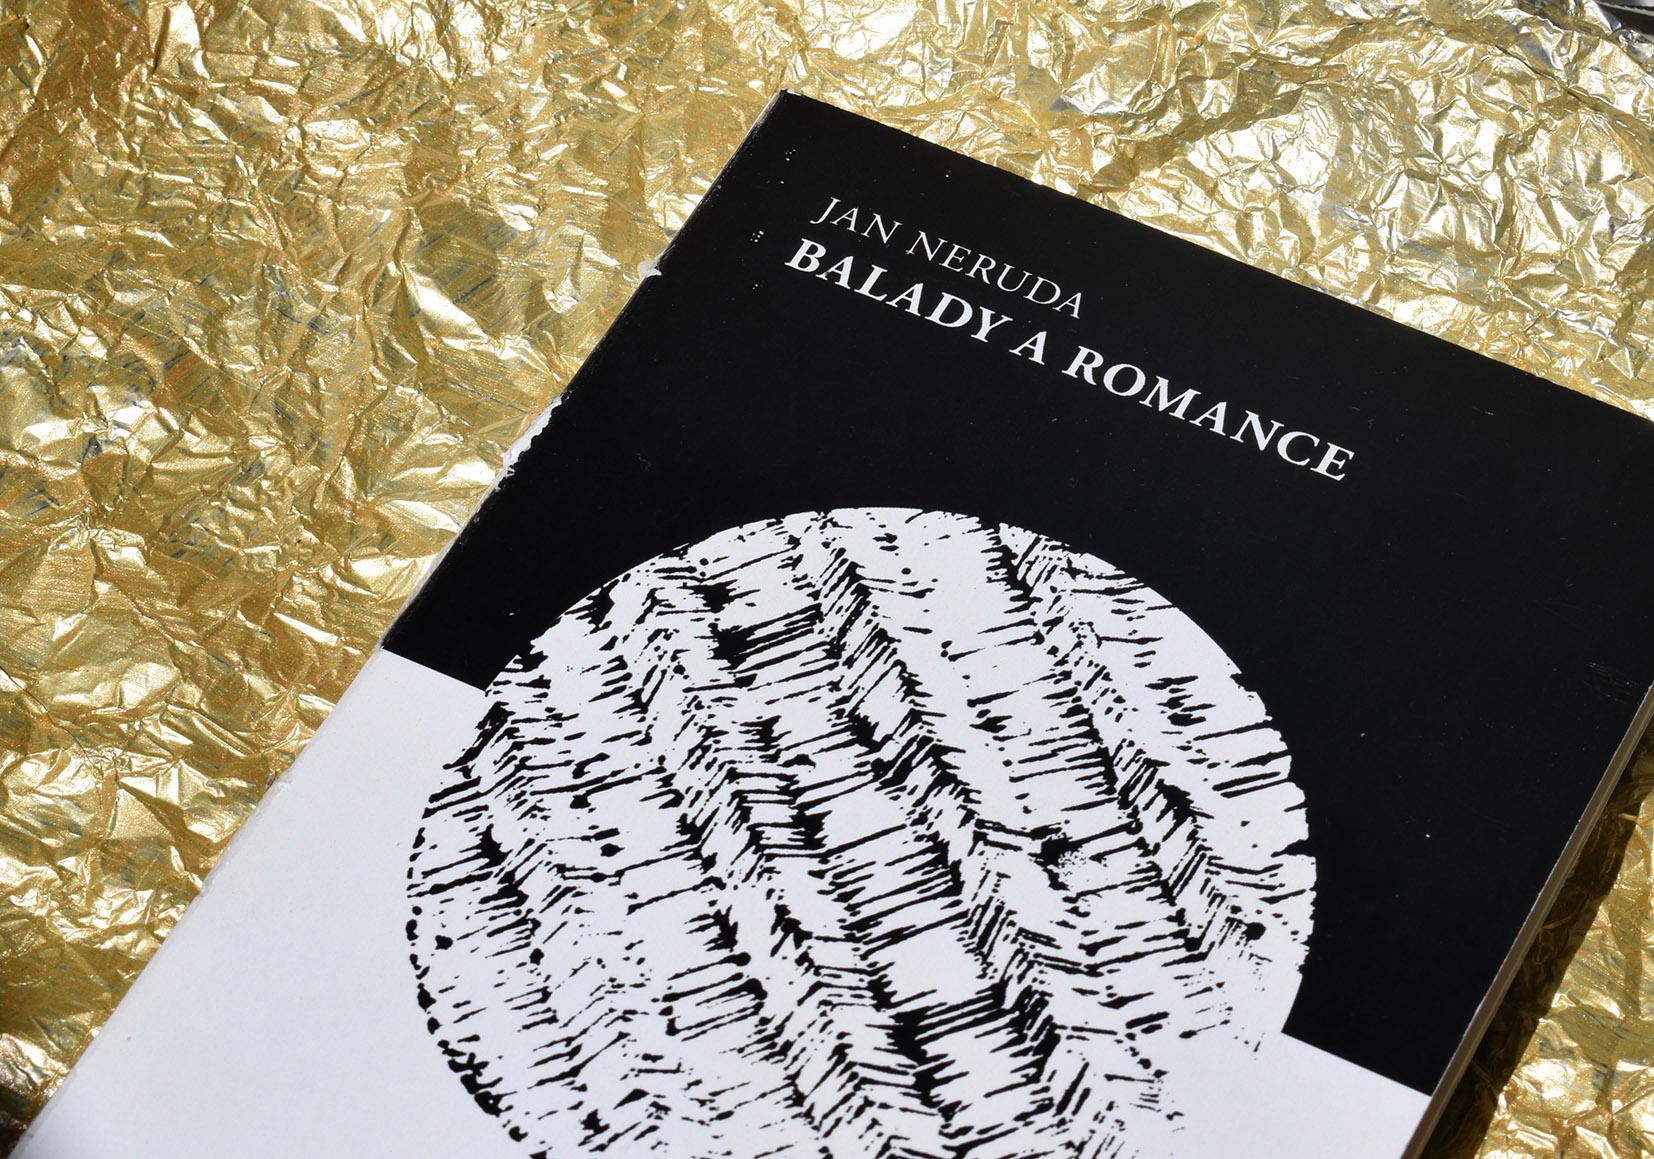 Jan Neruda<br> Ballady a romance<br> P3b GPP<br> 2019/2020